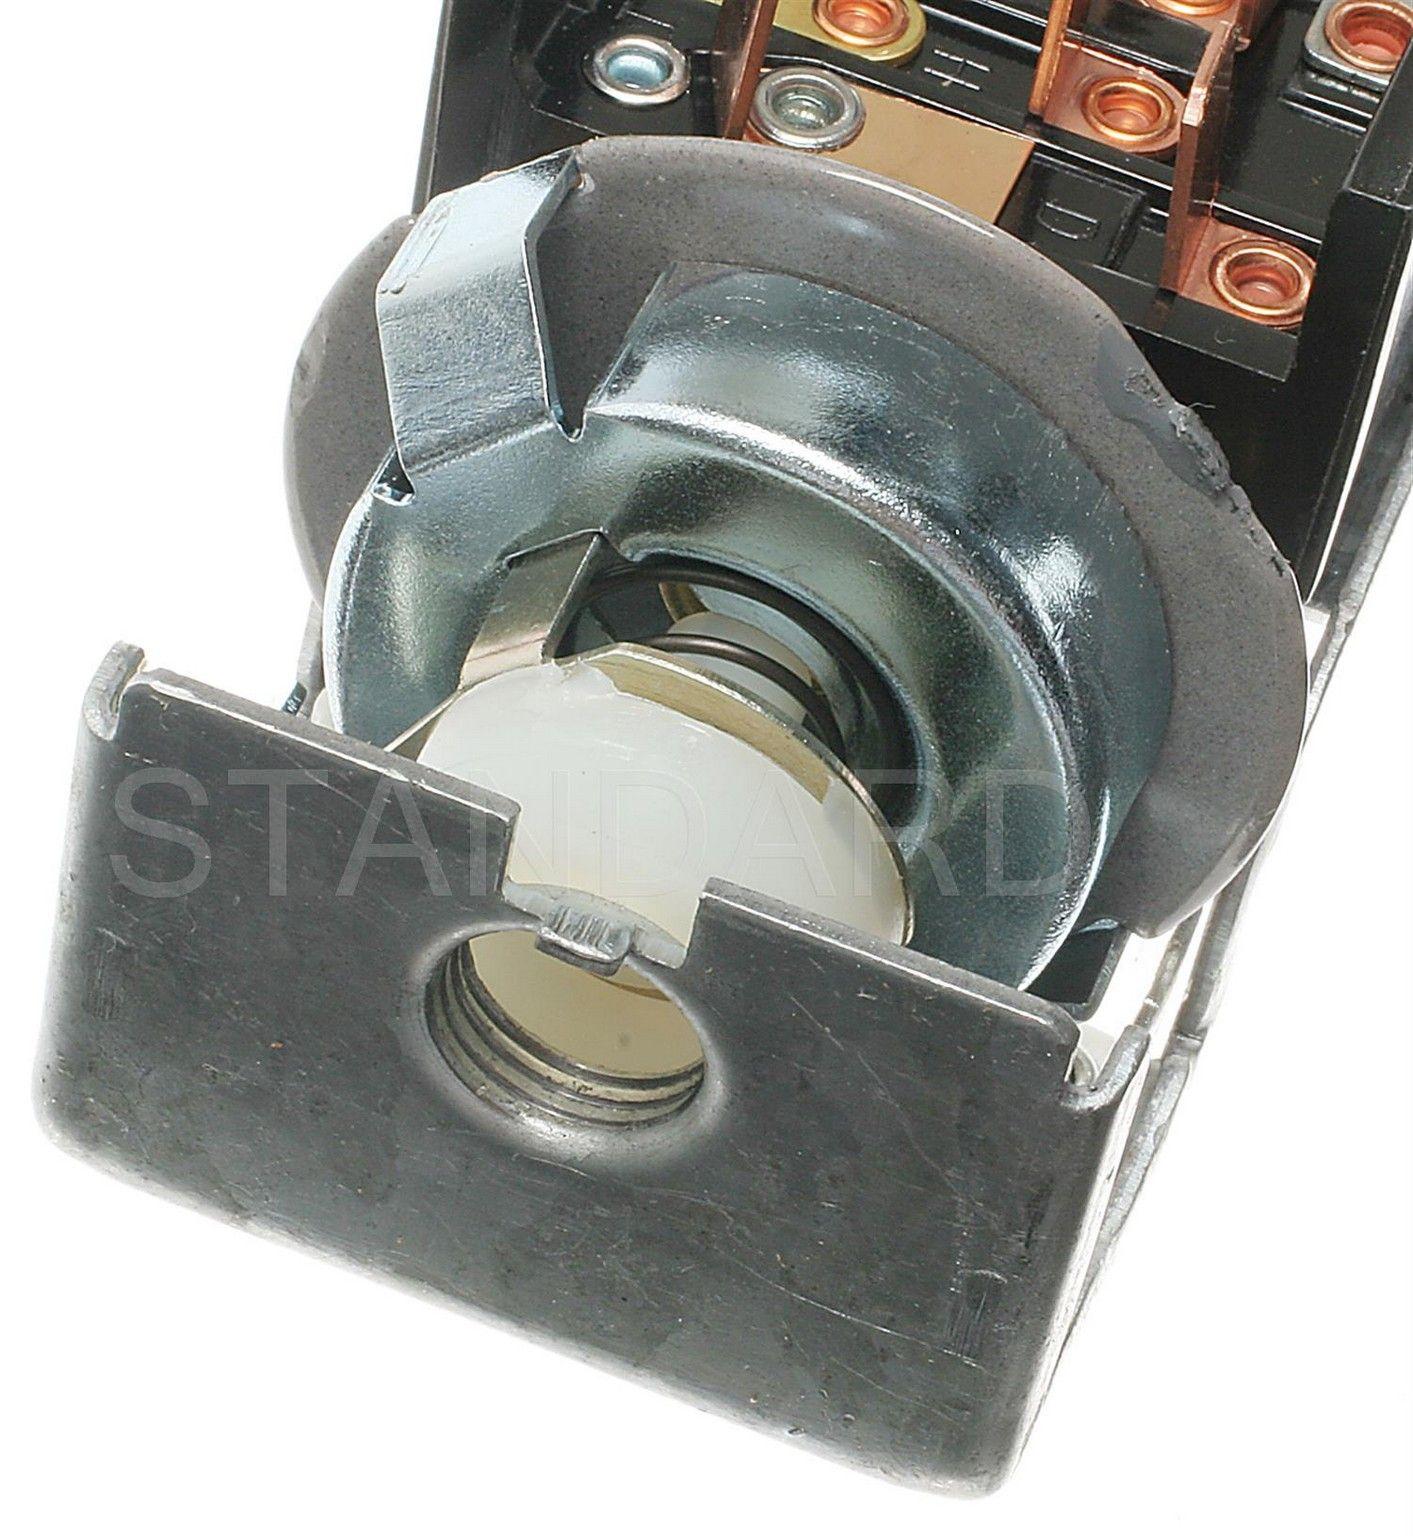 1998 Dodge Durango Headlight Switch Standard Ignition Ds 741